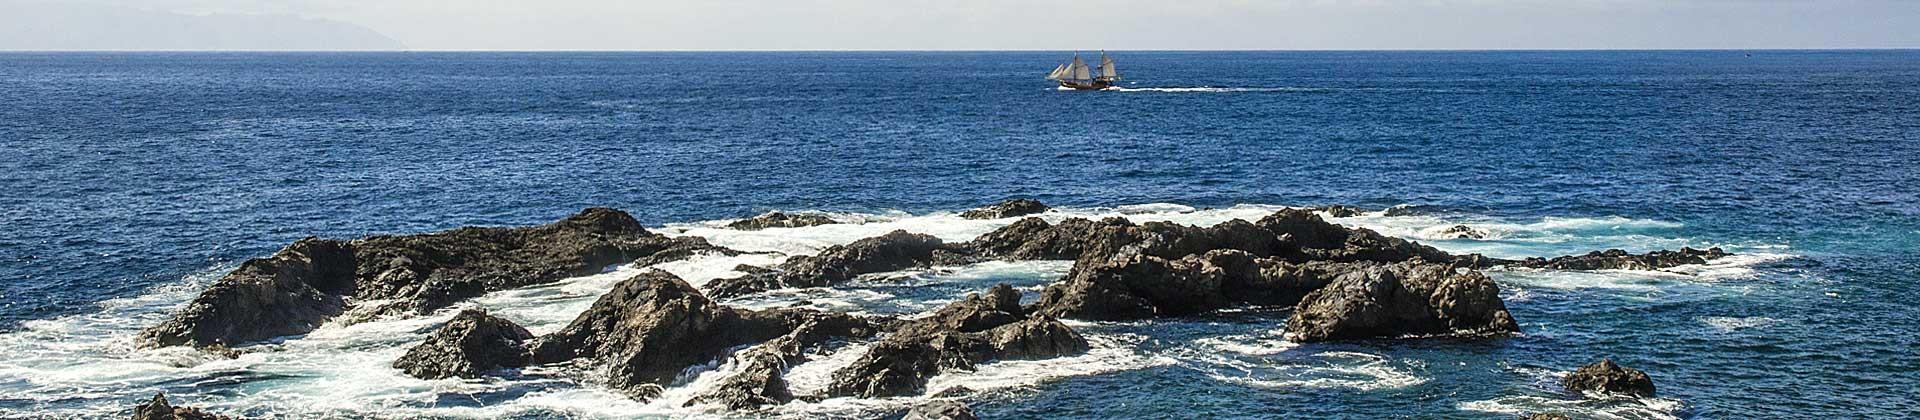 https://www.goodmorningtenerife.com/wp-content/uploads/2014/08/01_slide_los_gigantes_GM_Tenerife-1920x420.jpg